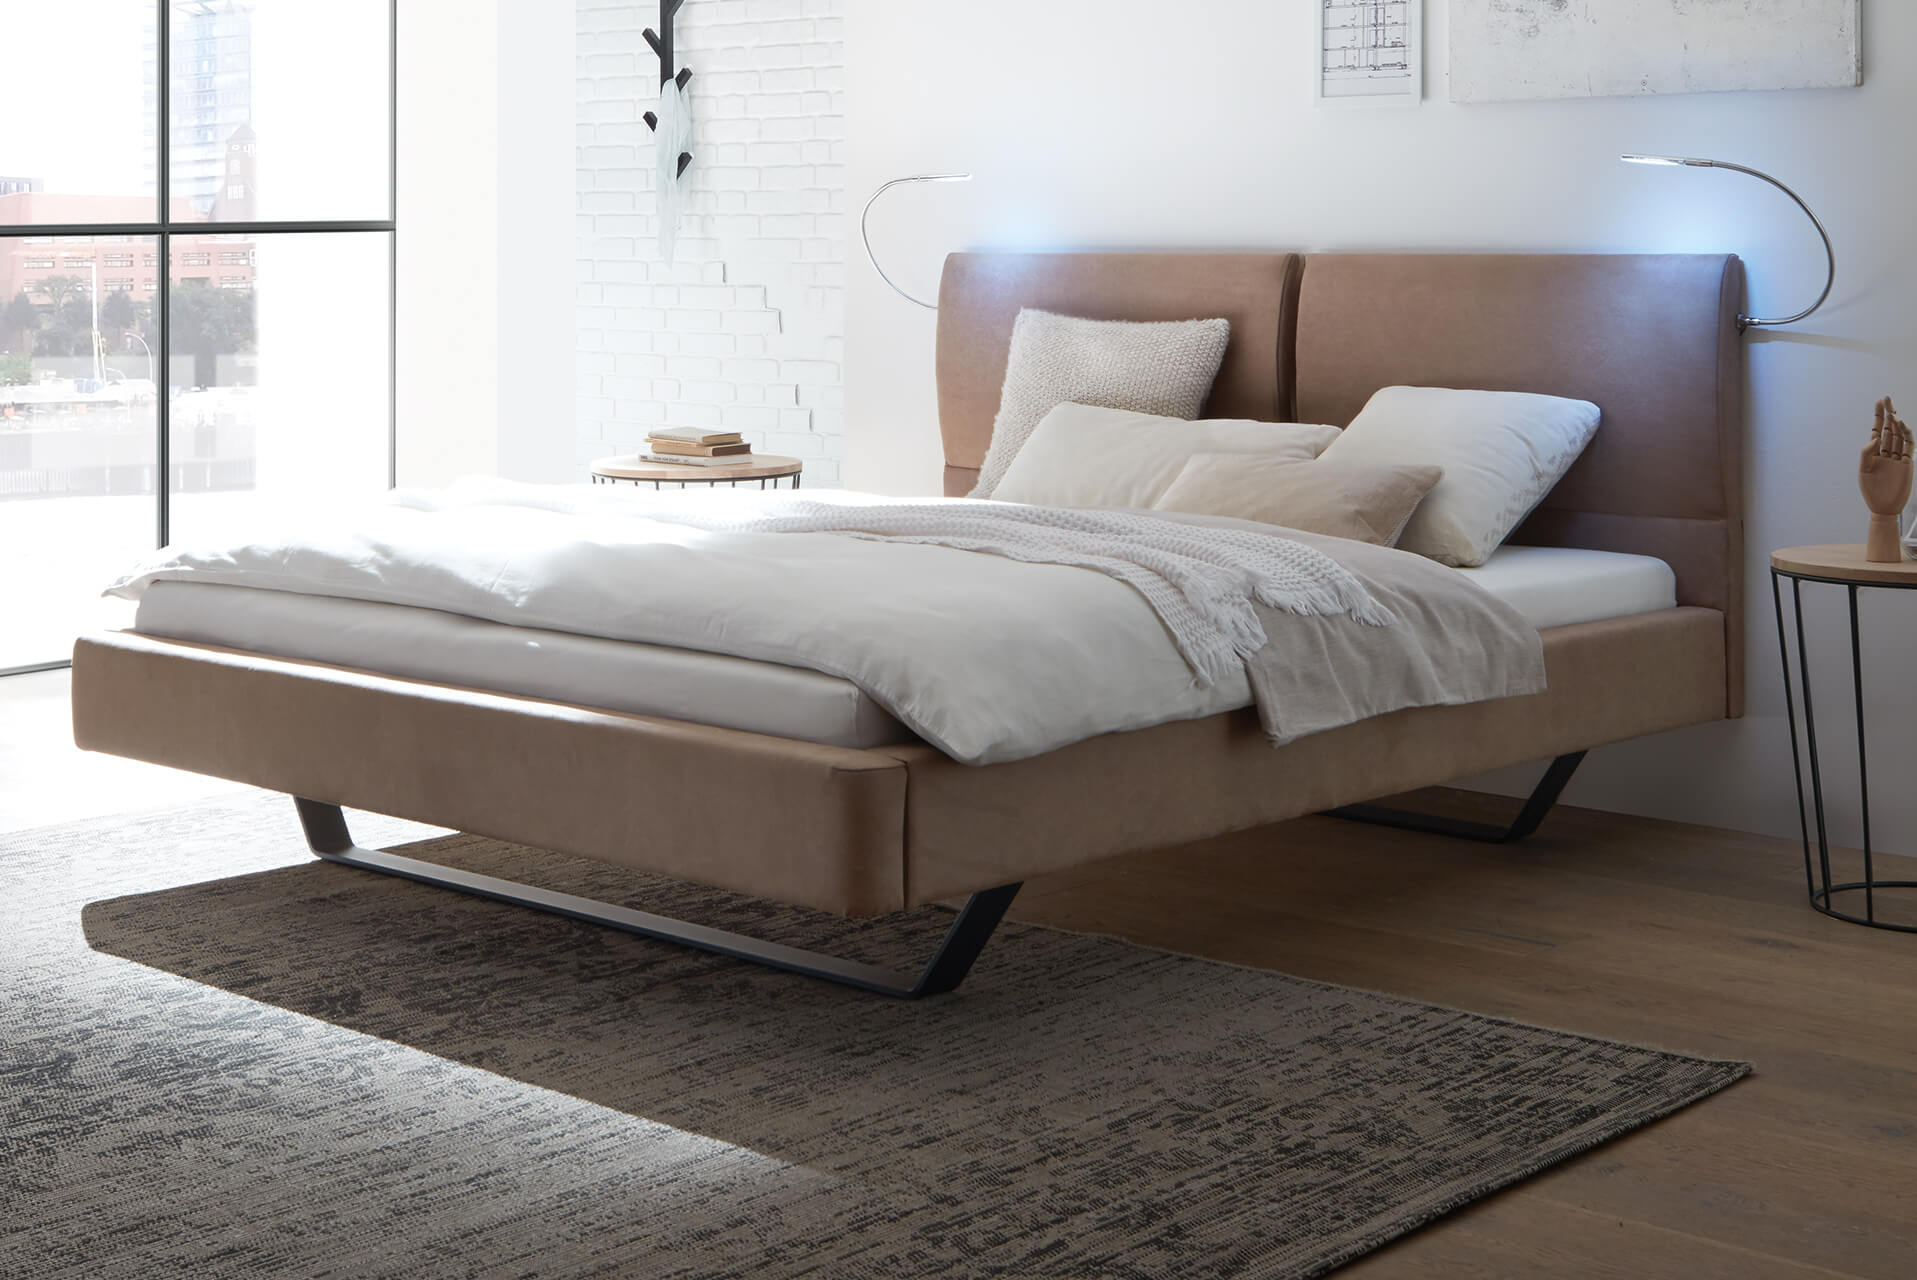 Full Size of Wasserbett Polsterbett Dreamline Sole 18 3s Kopfteil Siena Betten 200x220 Bett Wohnzimmer Polsterbett 200x220